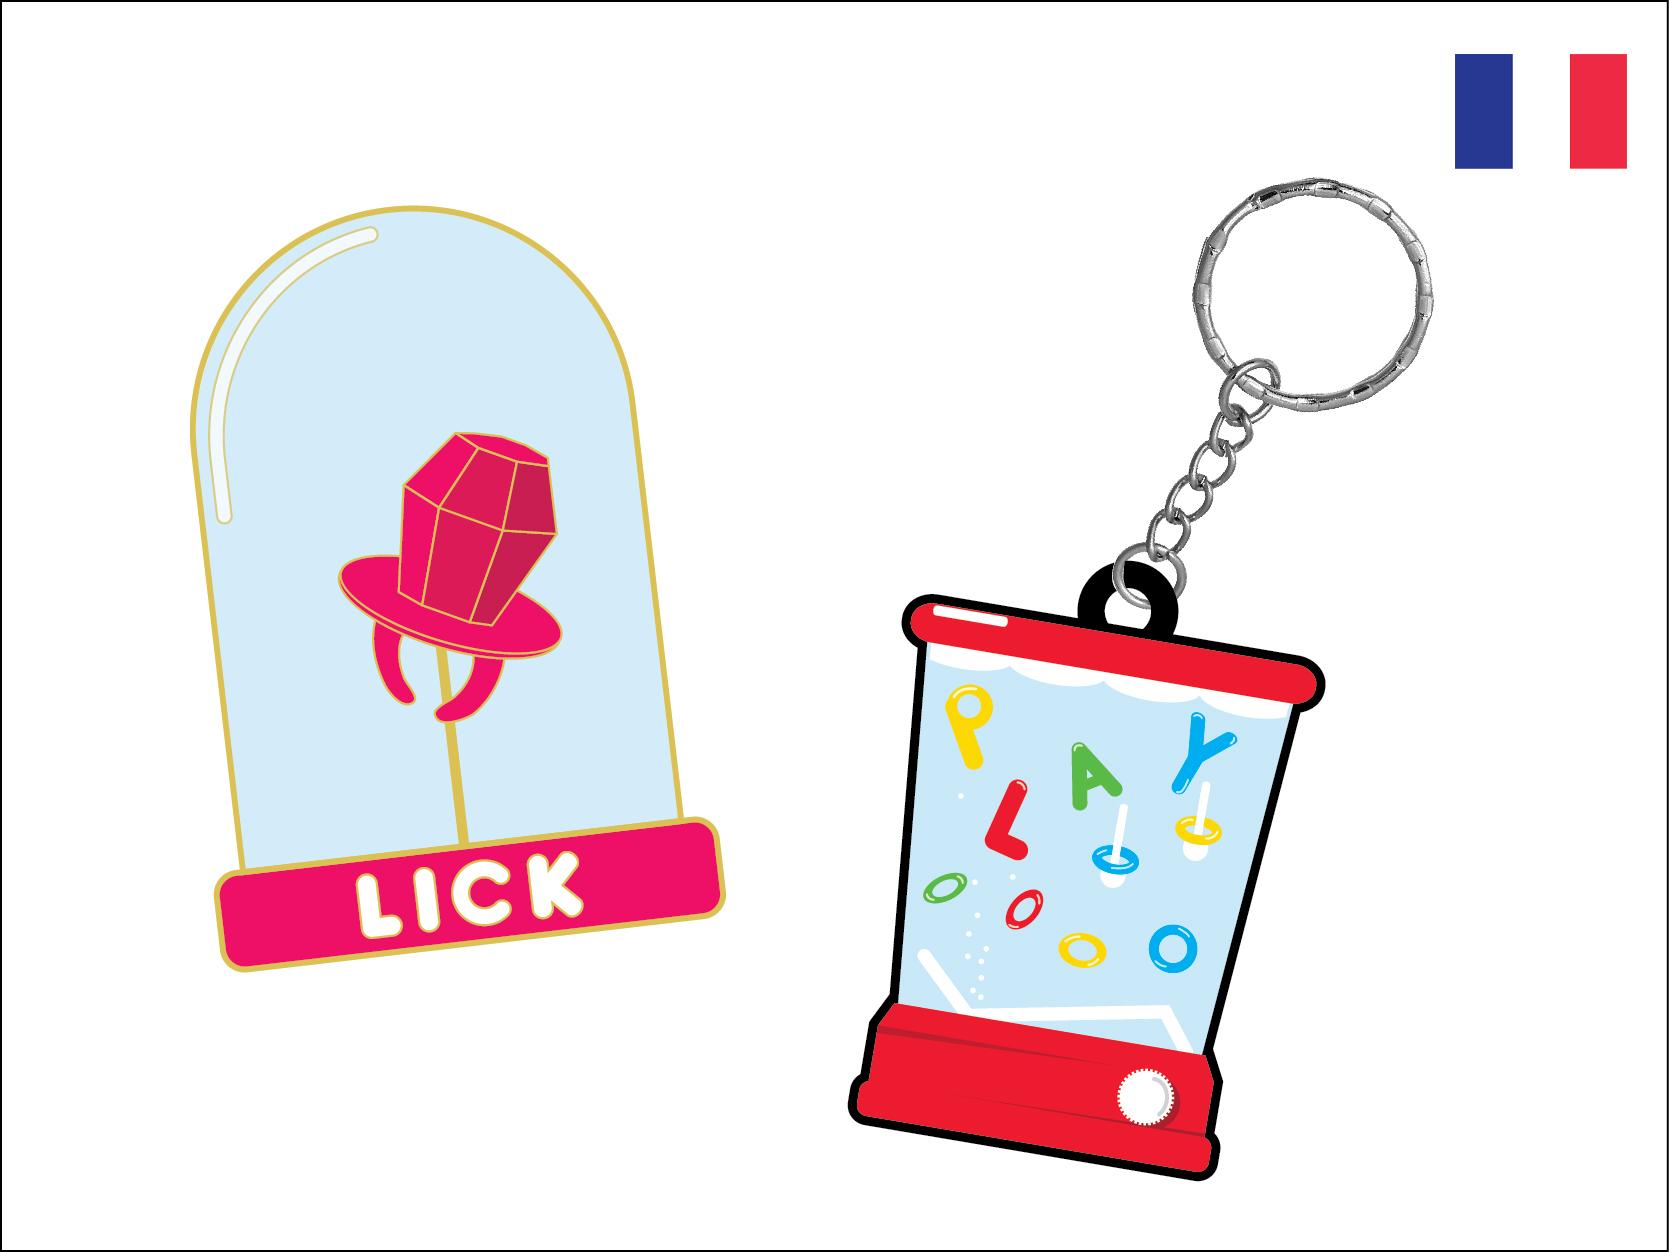 lick_pins_play_keychain_france-1511096295.jpg